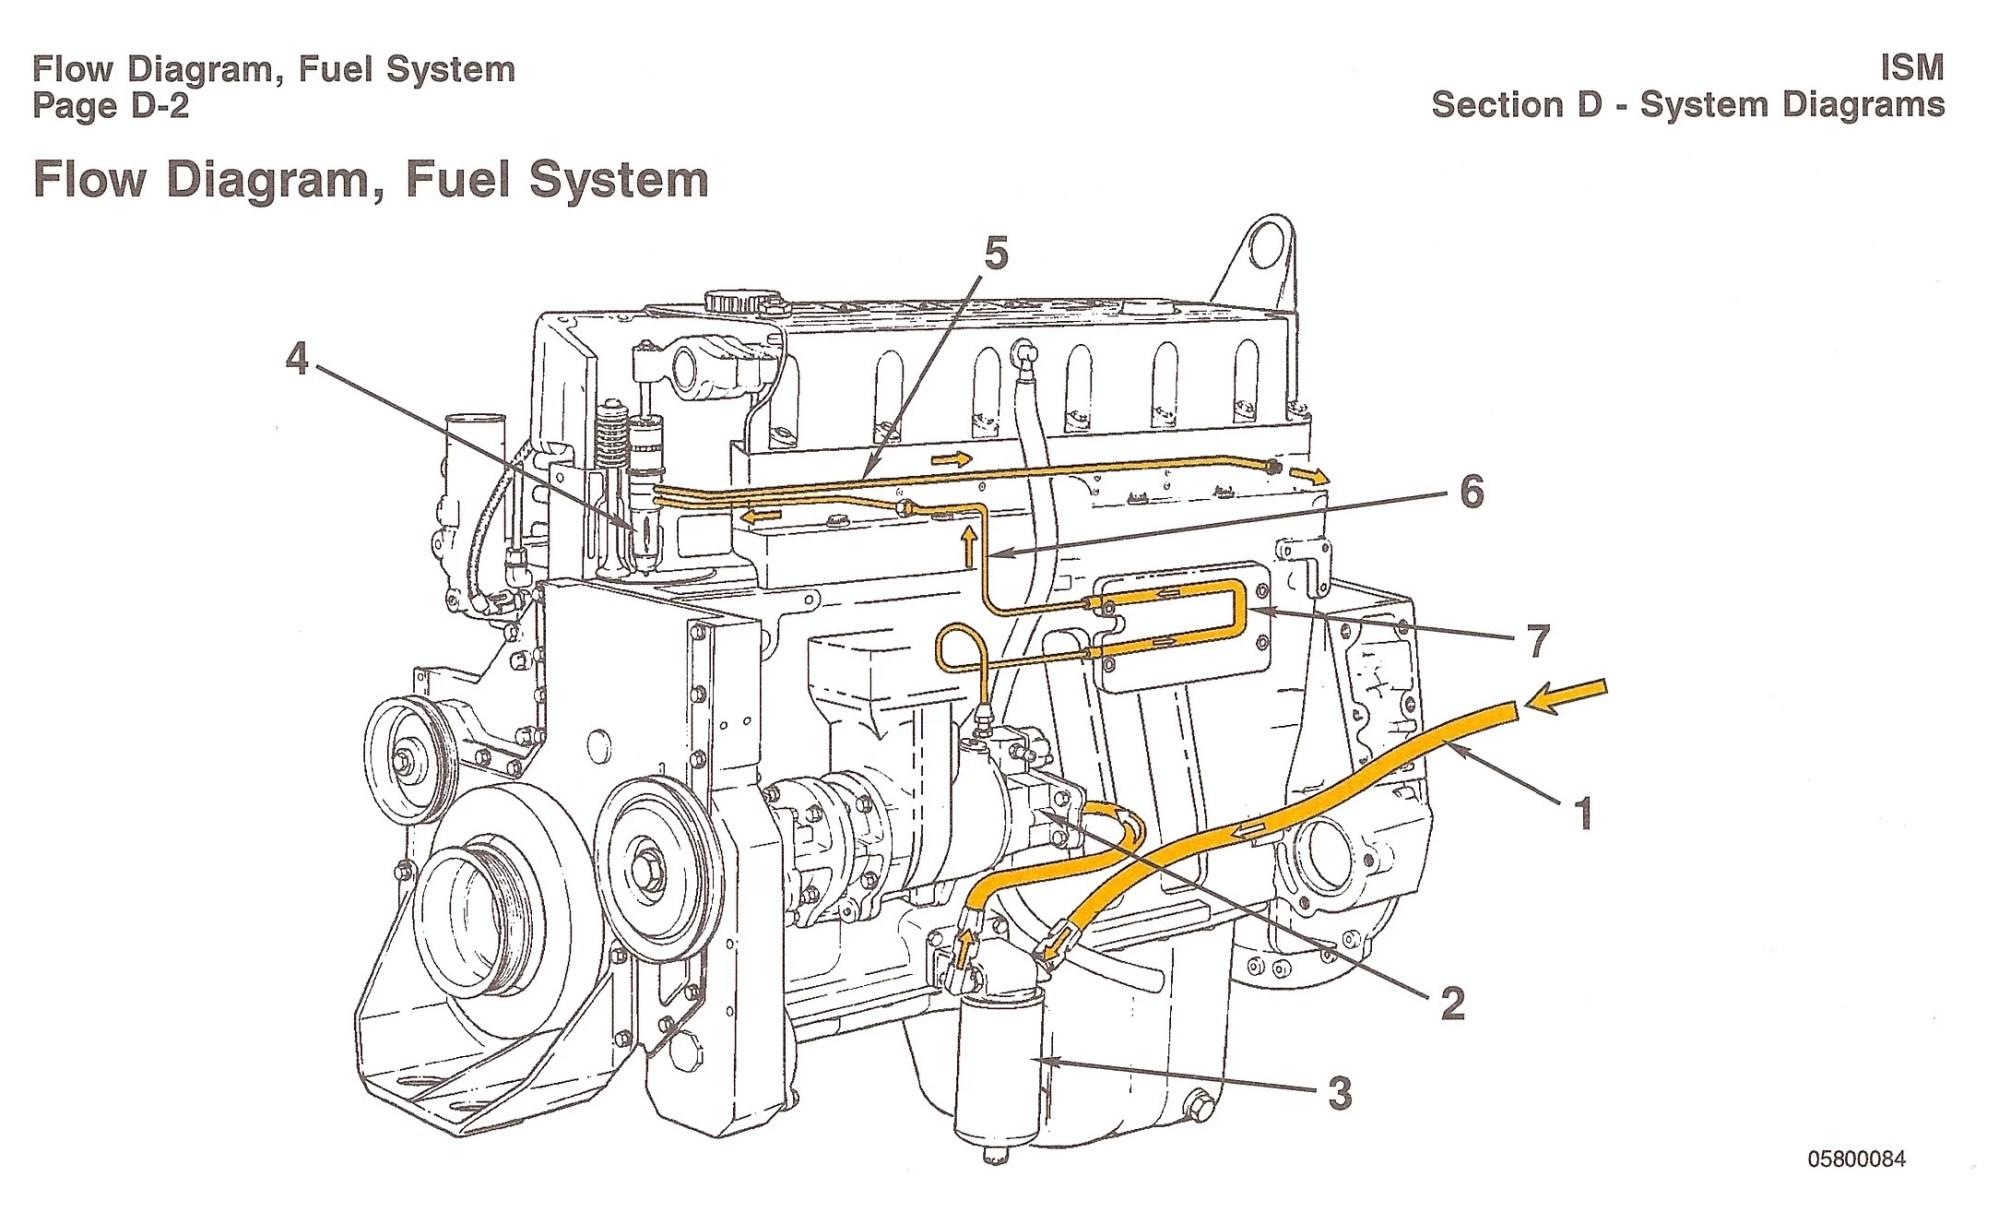 hight resolution of cummins fuel system flow diagram